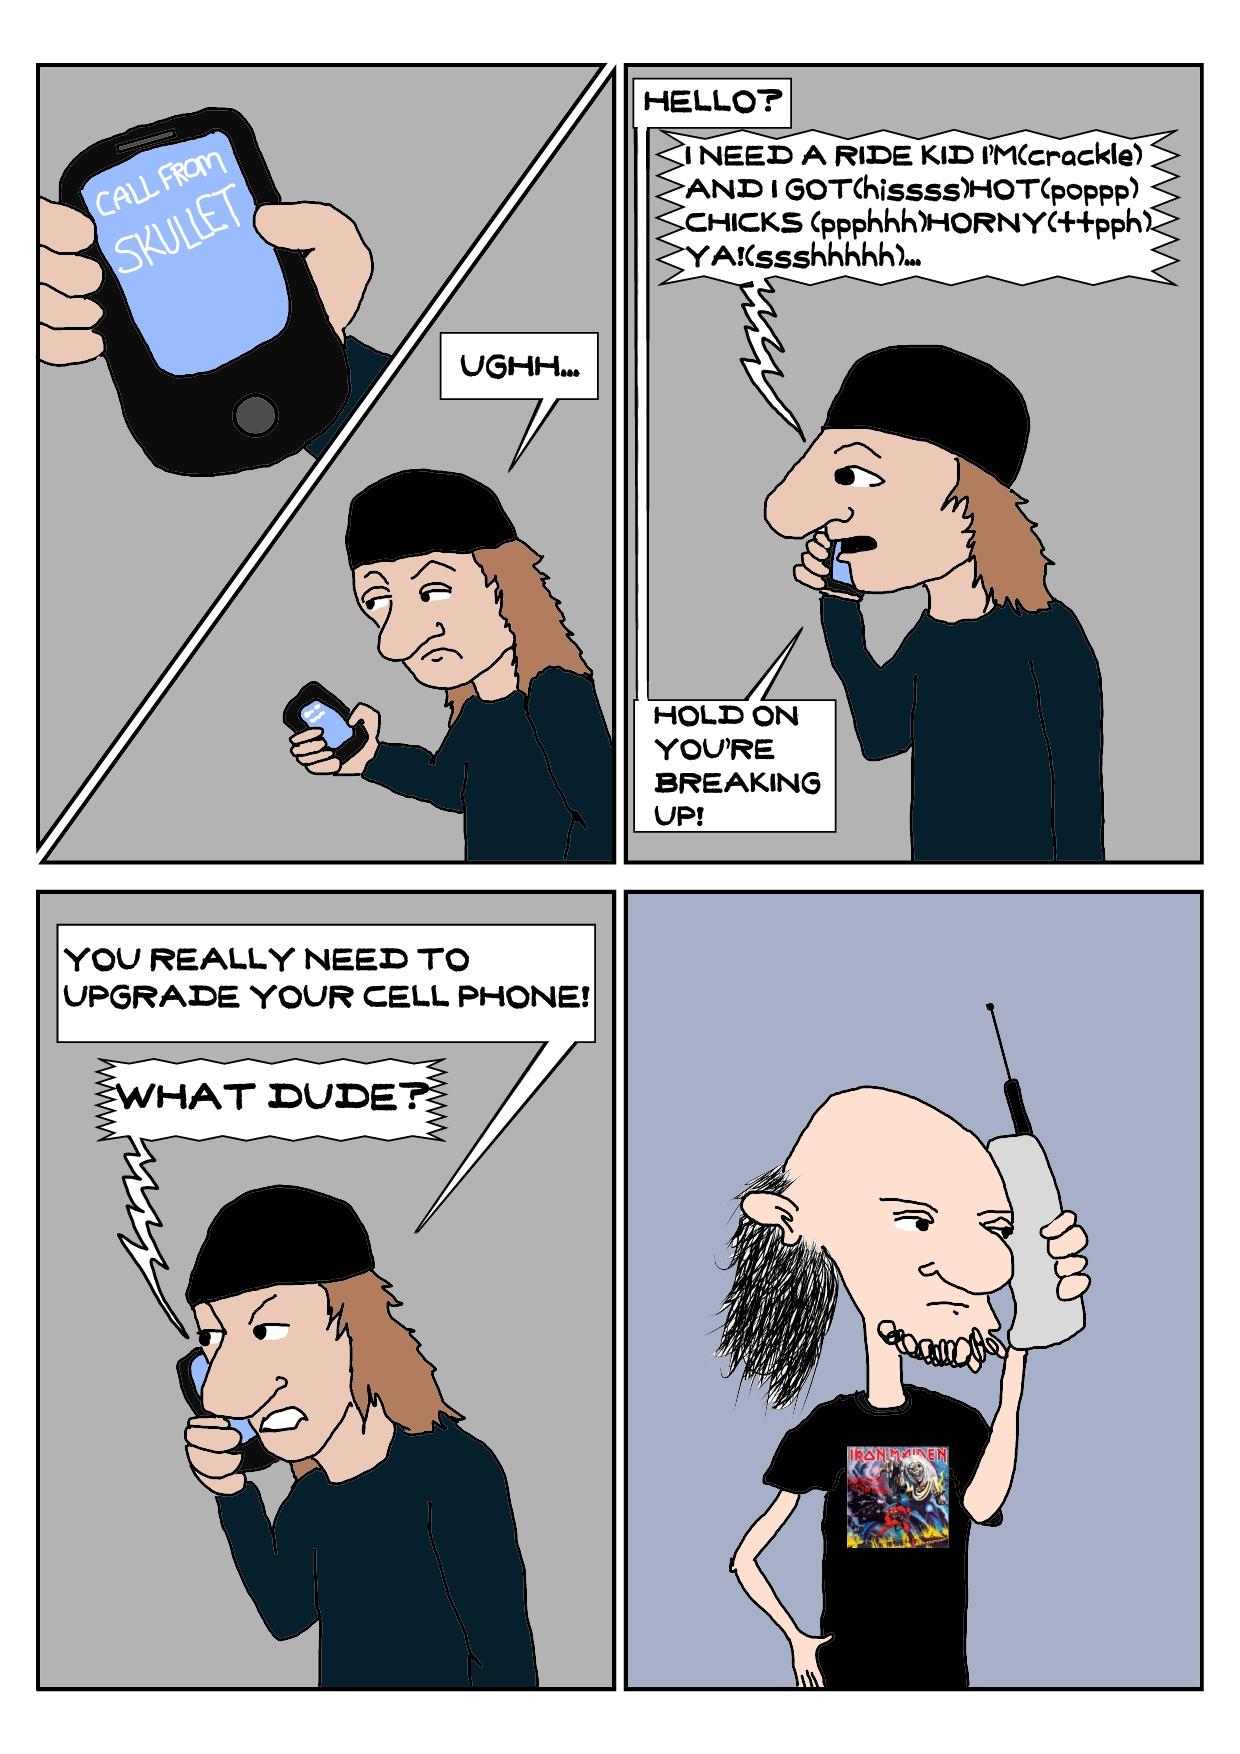 Skullet-Cell Phone